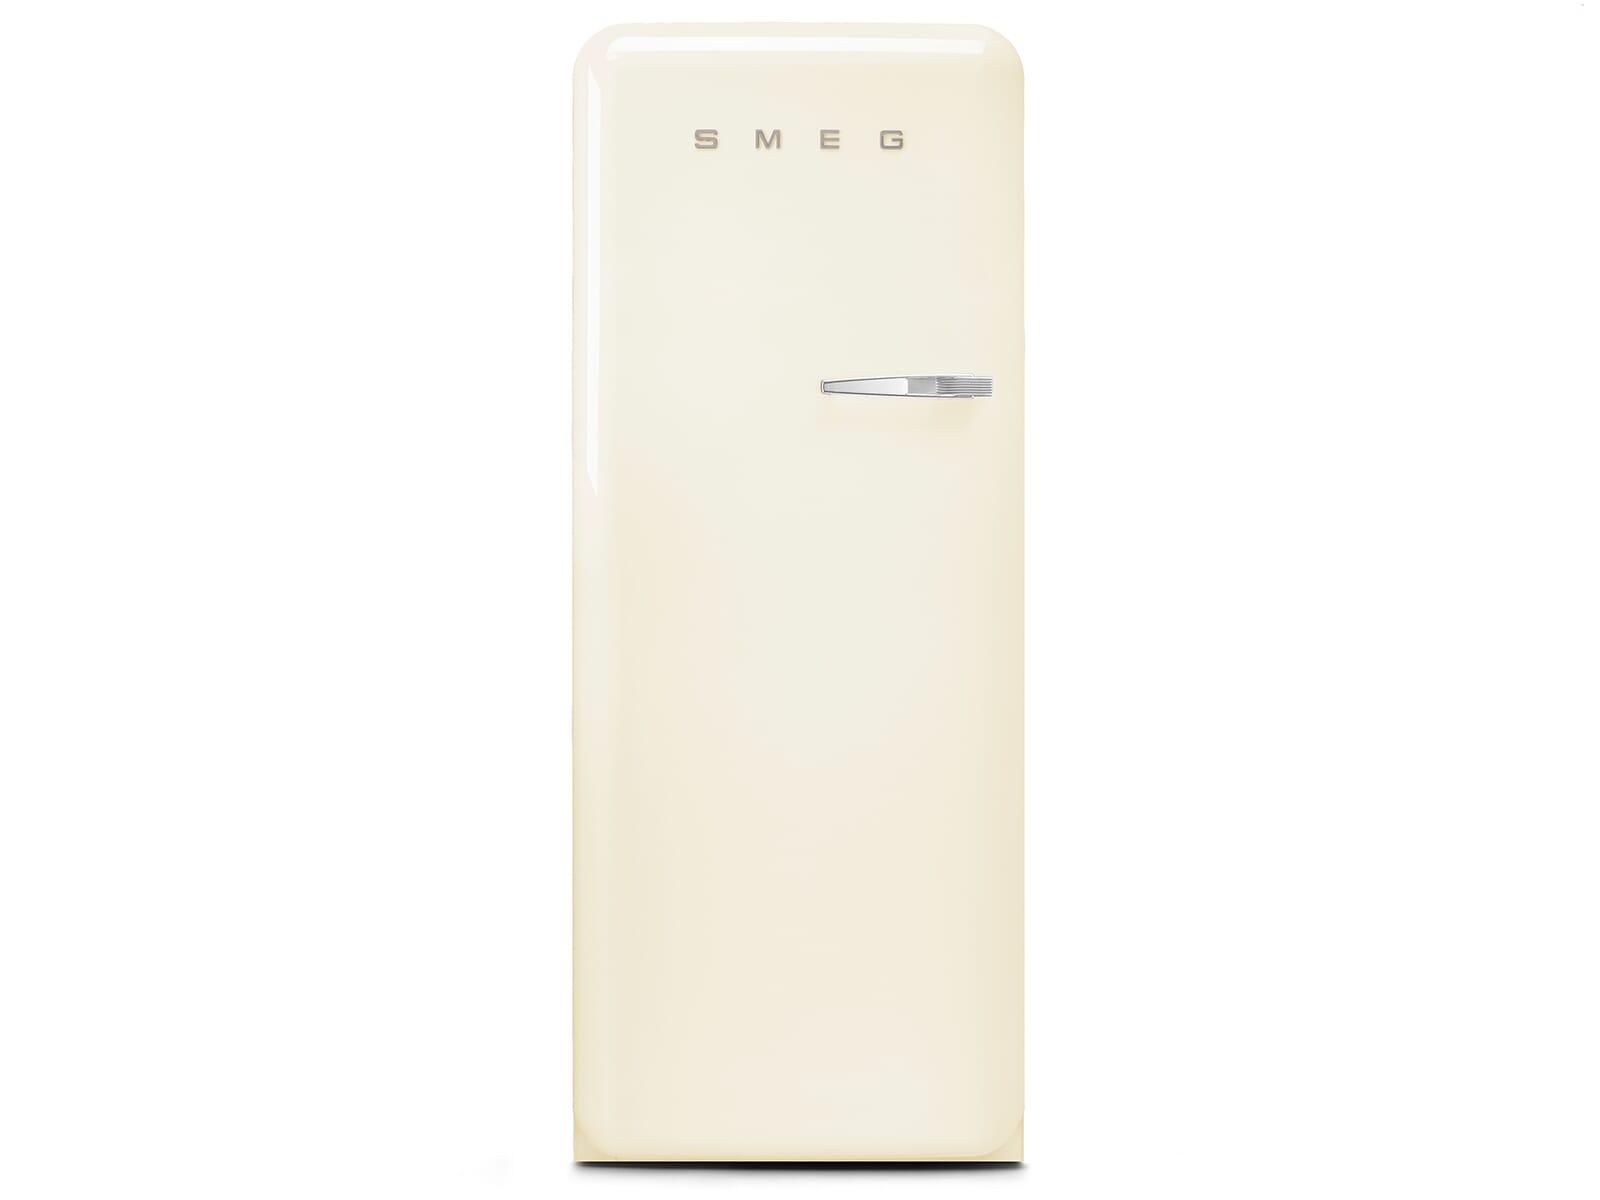 Retro Kühlschrank Linksanschlag : Smeg fab lcr standkühlschrank creme